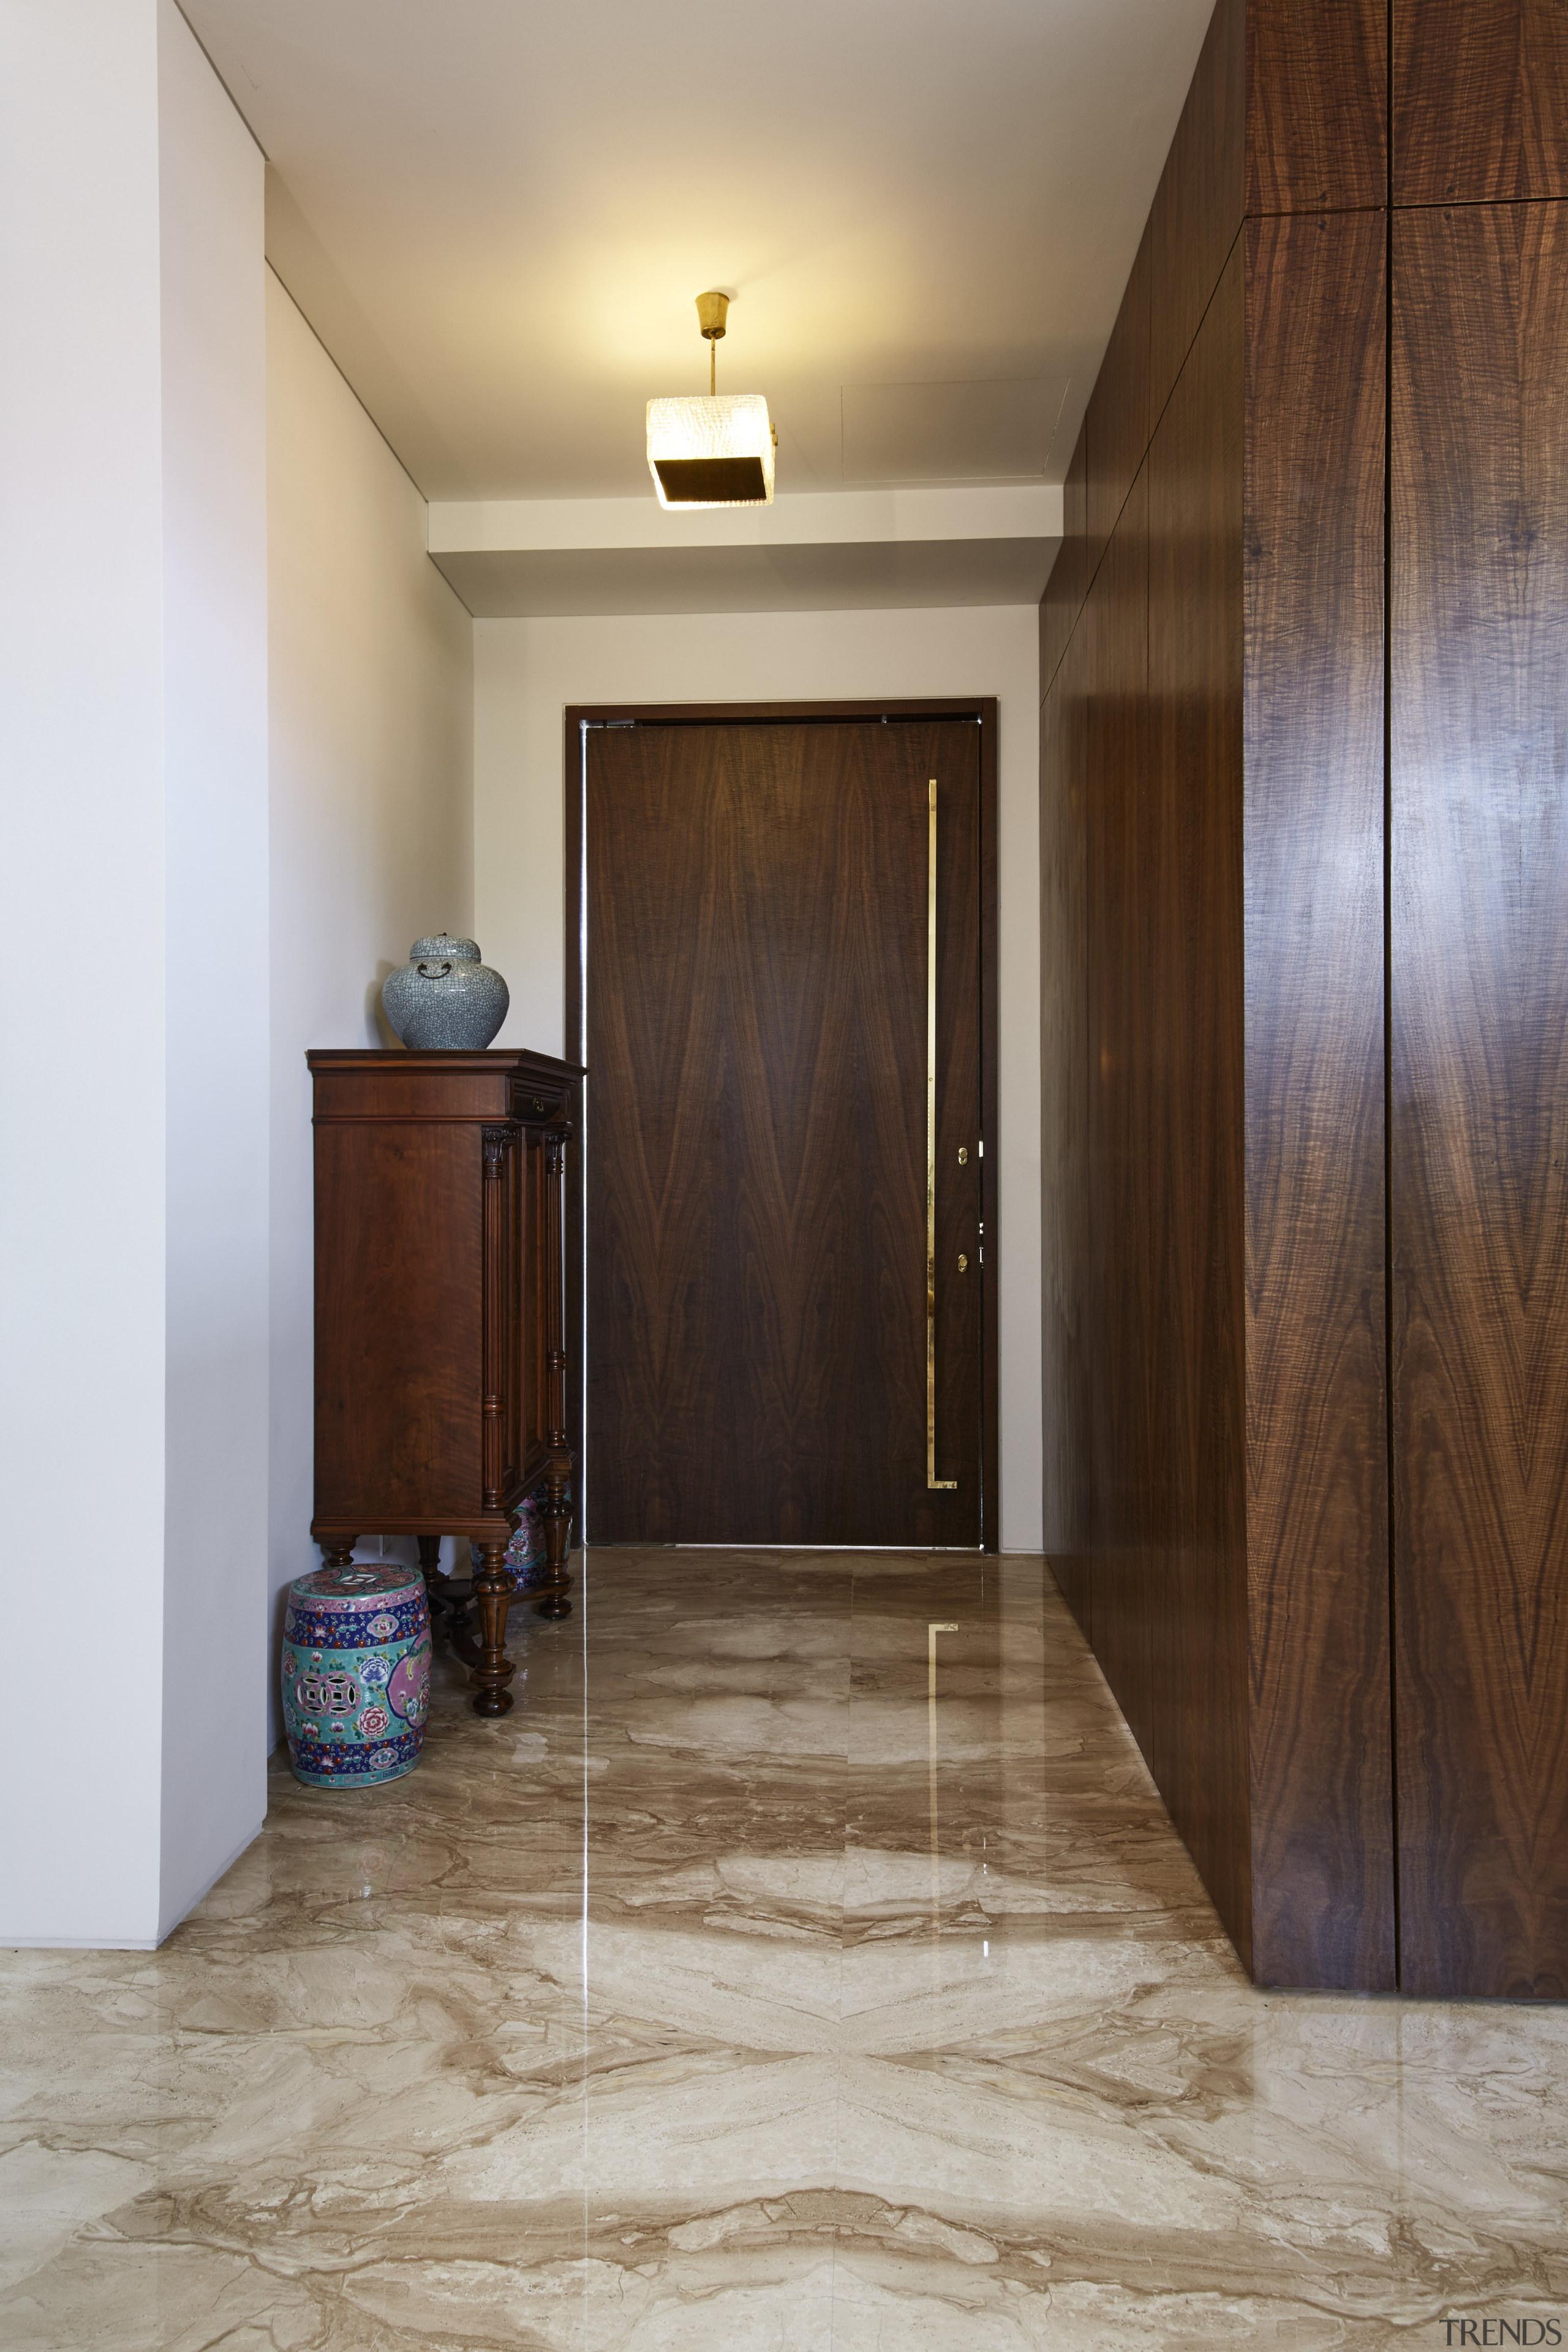 Matched veneer on the front door and Italian door, floor, flooring, hardwood, home, interior design, laminate flooring, real estate, room, tile, wall, wood, wood flooring, wood stain, brown, gray